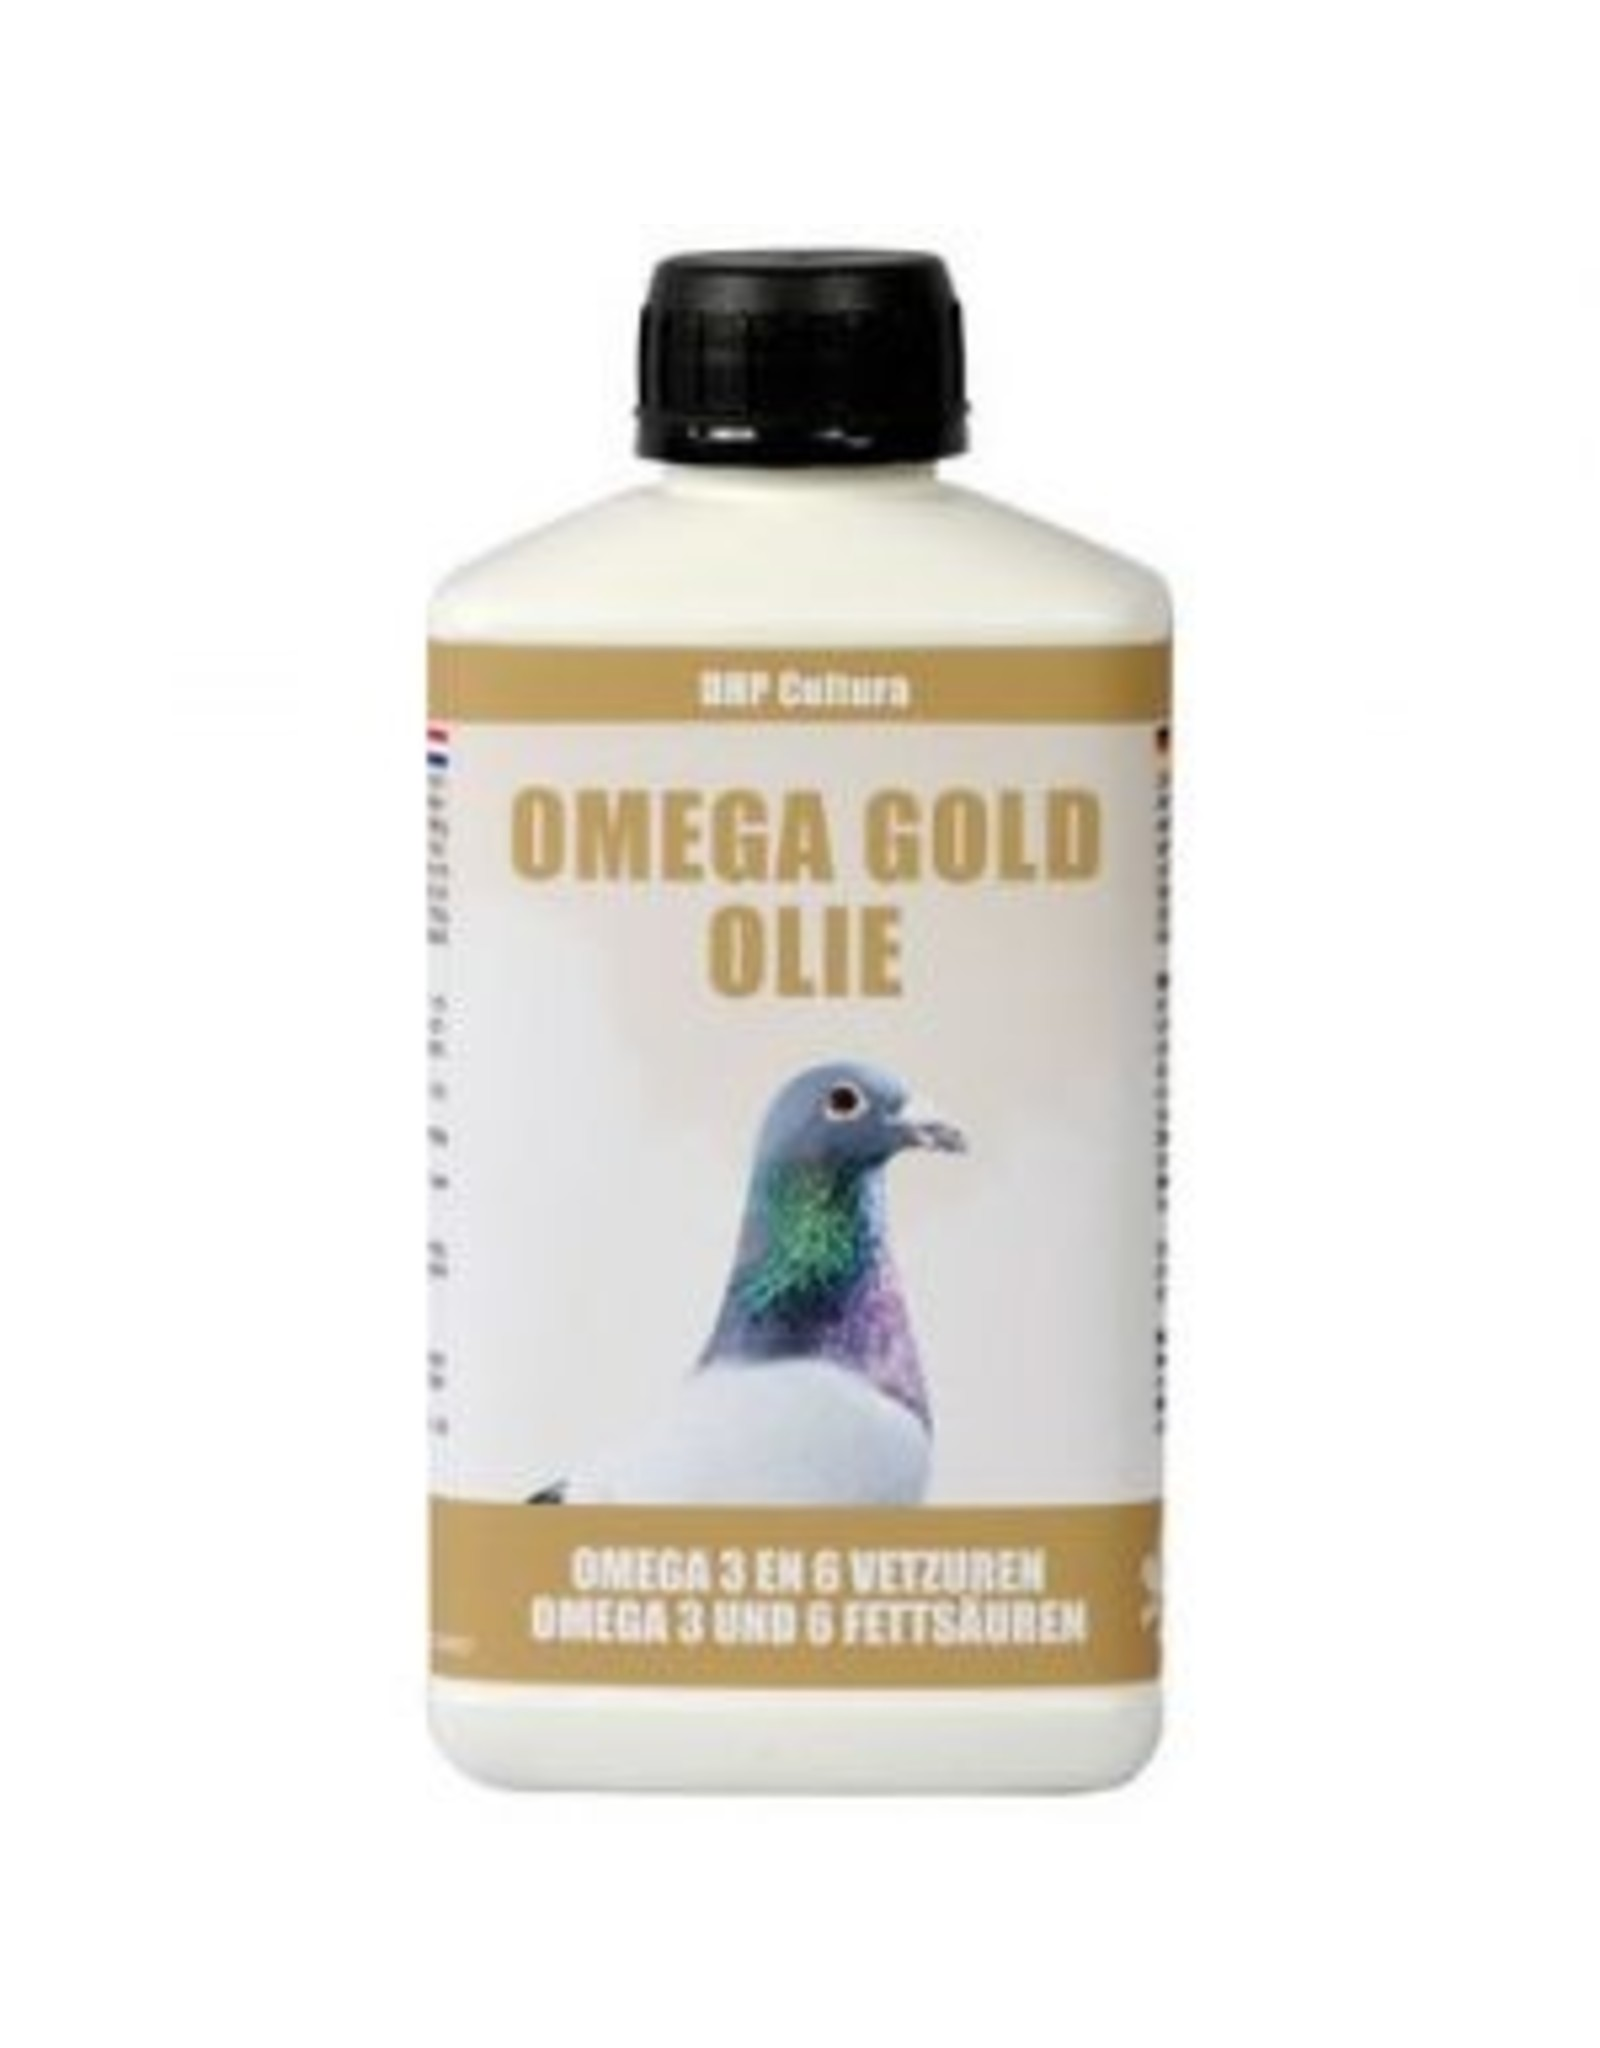 DHP Cultura Omega gold olie - 500 ML